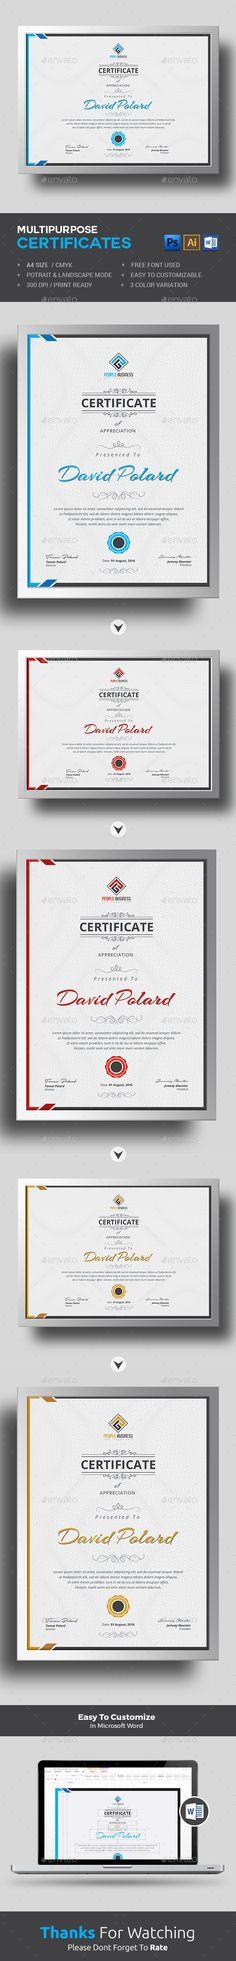 Certificate Template PSD, AI Illustrator. Download here: https://graphicriver.net/item/certificate/17623087?ref=ksioks